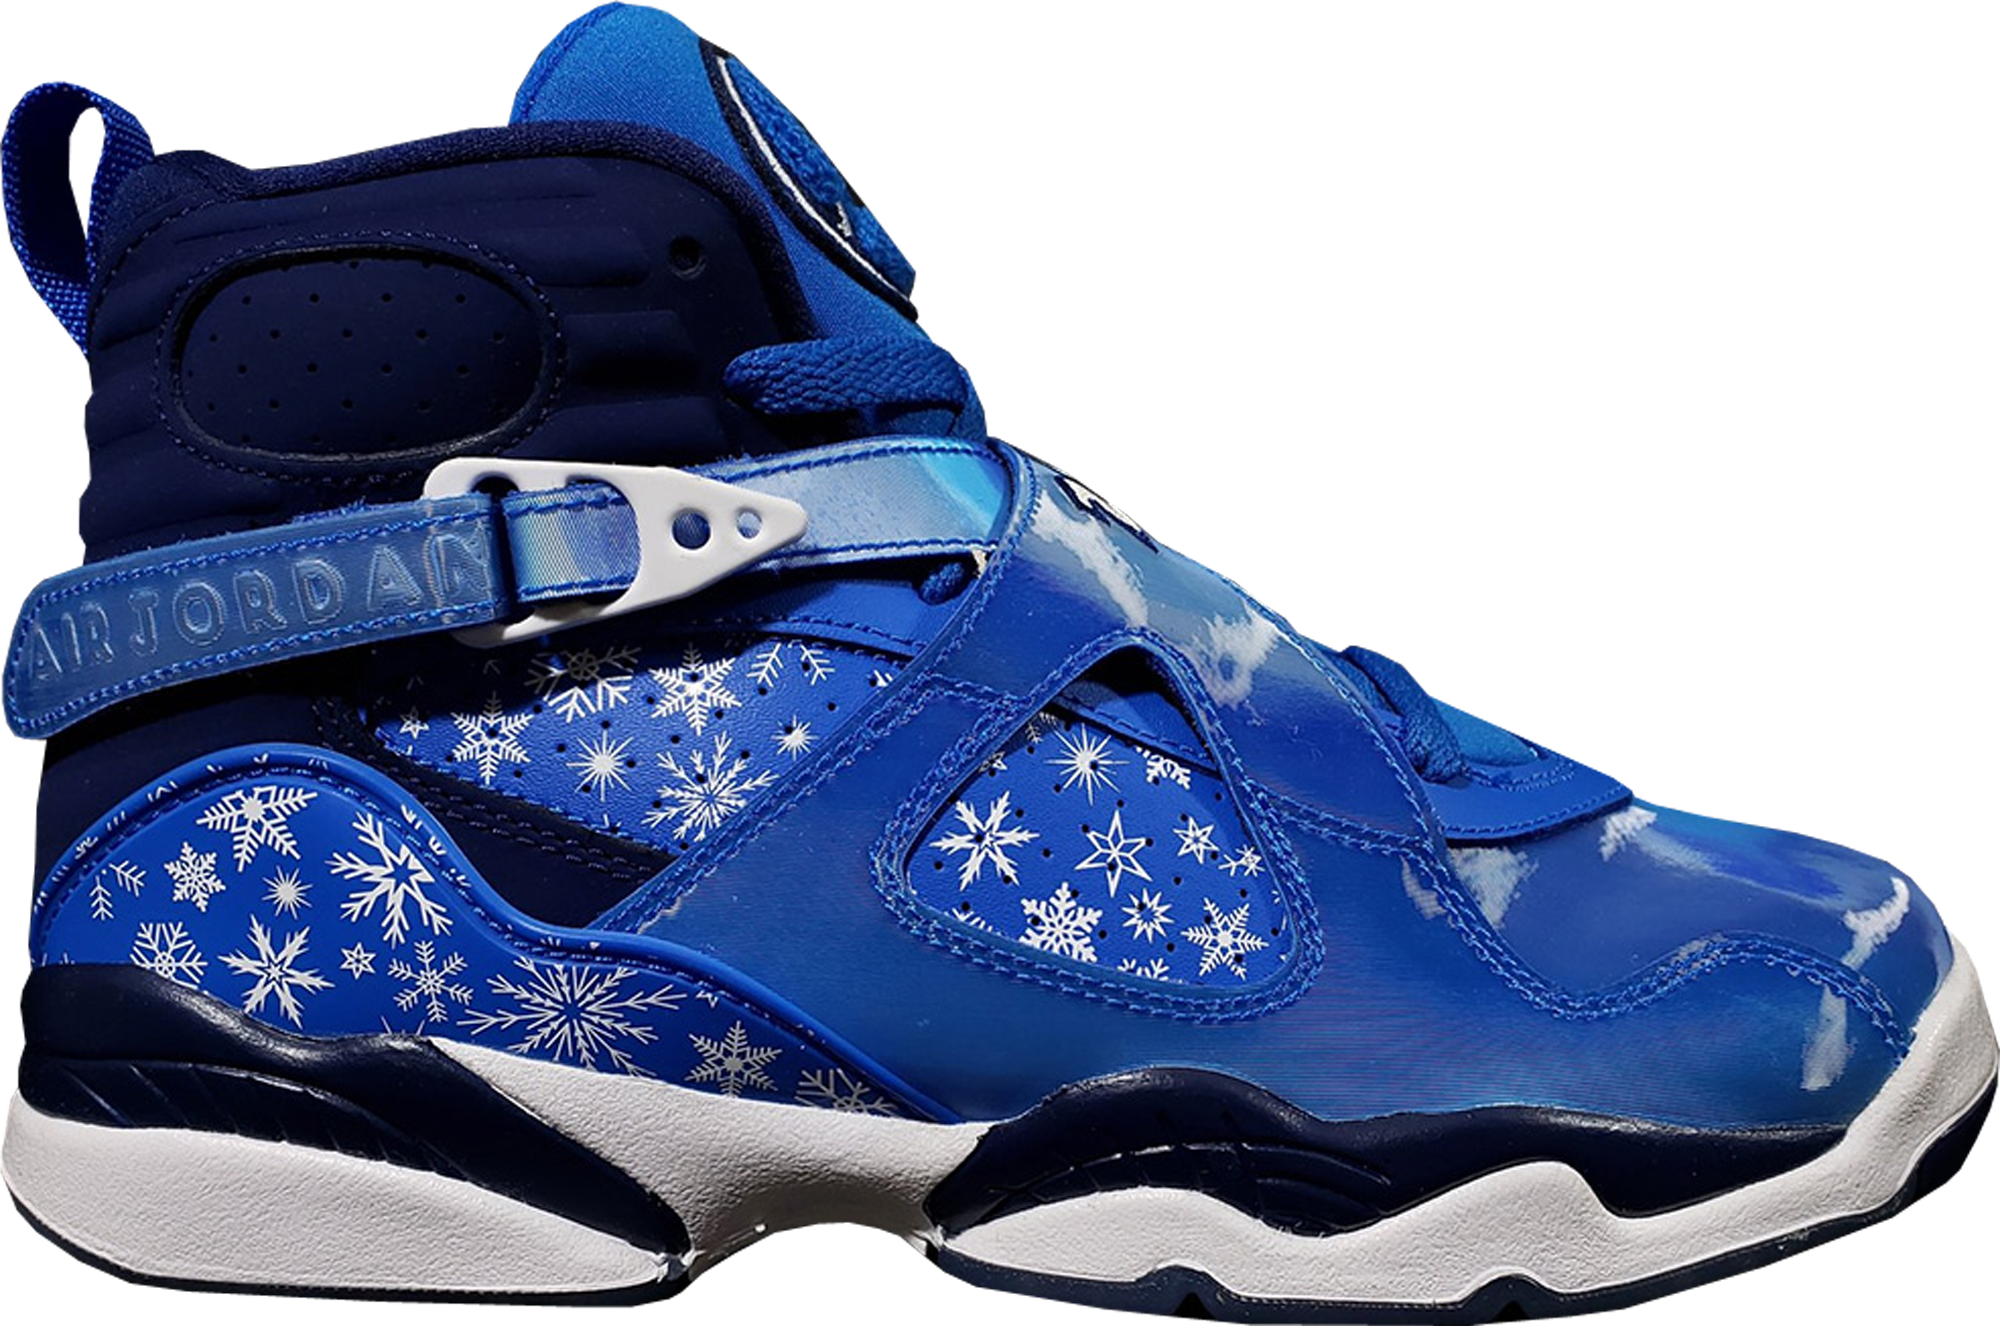 "Details about Nike Air Jordan 8 Retro GS Shoes ""Snowflake"" Size 6Y (305368 400) WhiteBlue."